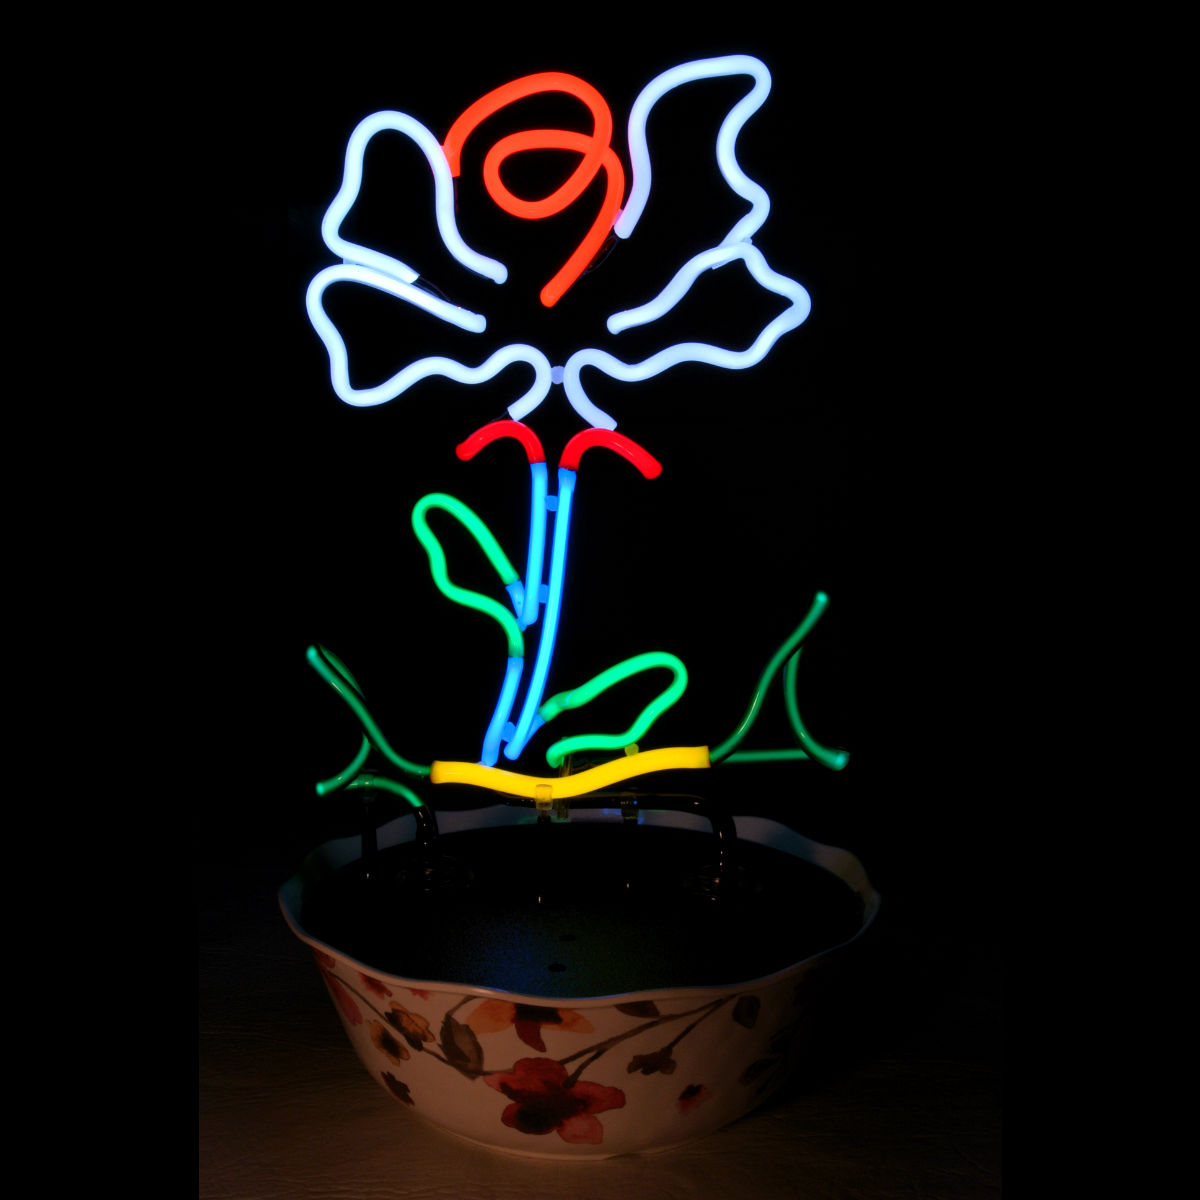 Custom Neon Floral Arrangements by John Barton - Neon Light Sculptor